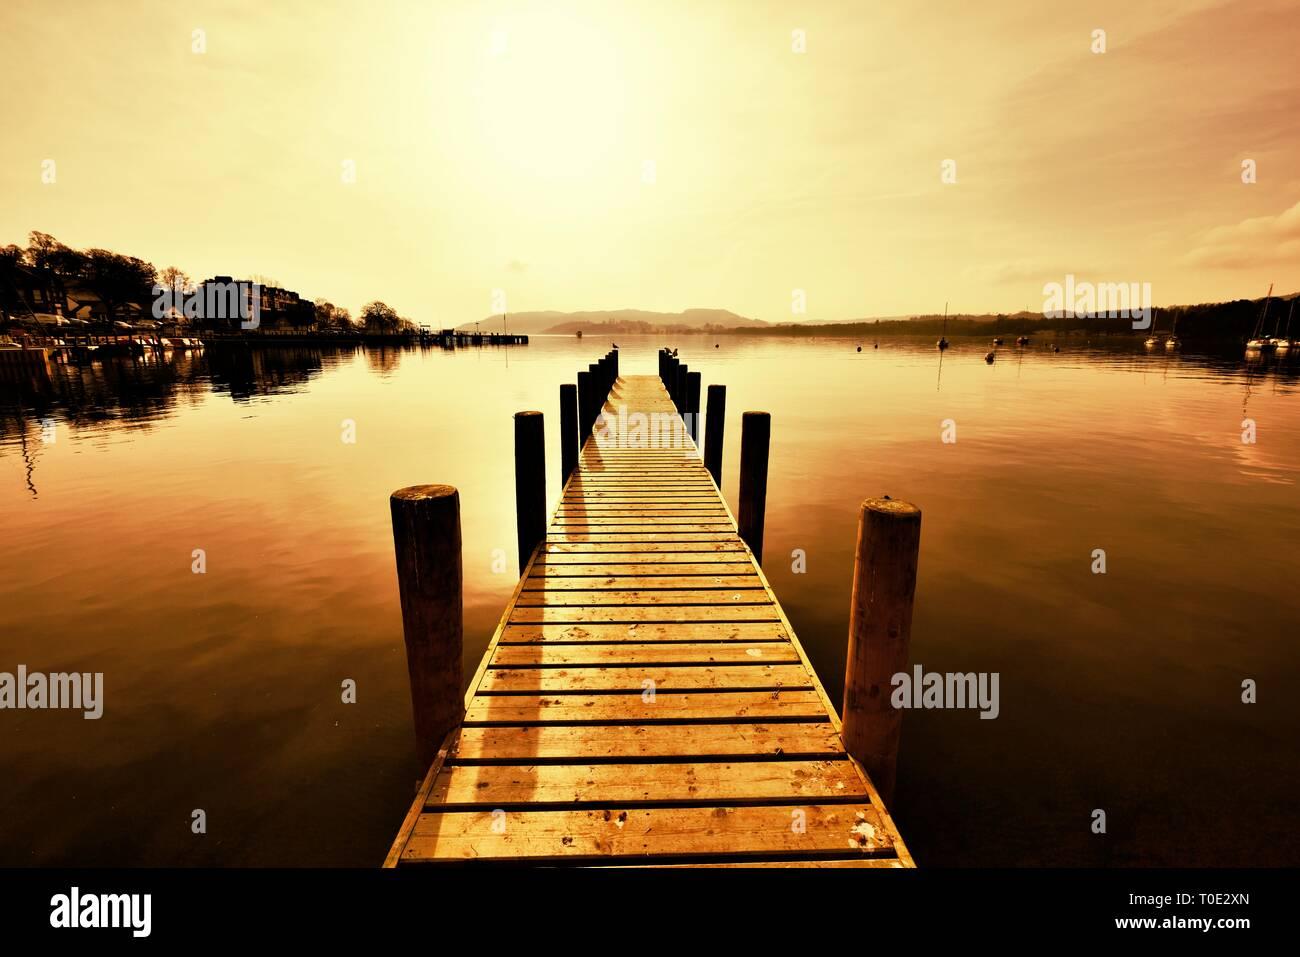 Waterhead,Ambleside,Lake Windermere,Lake District,Cumbria,England,UK Stock Photo